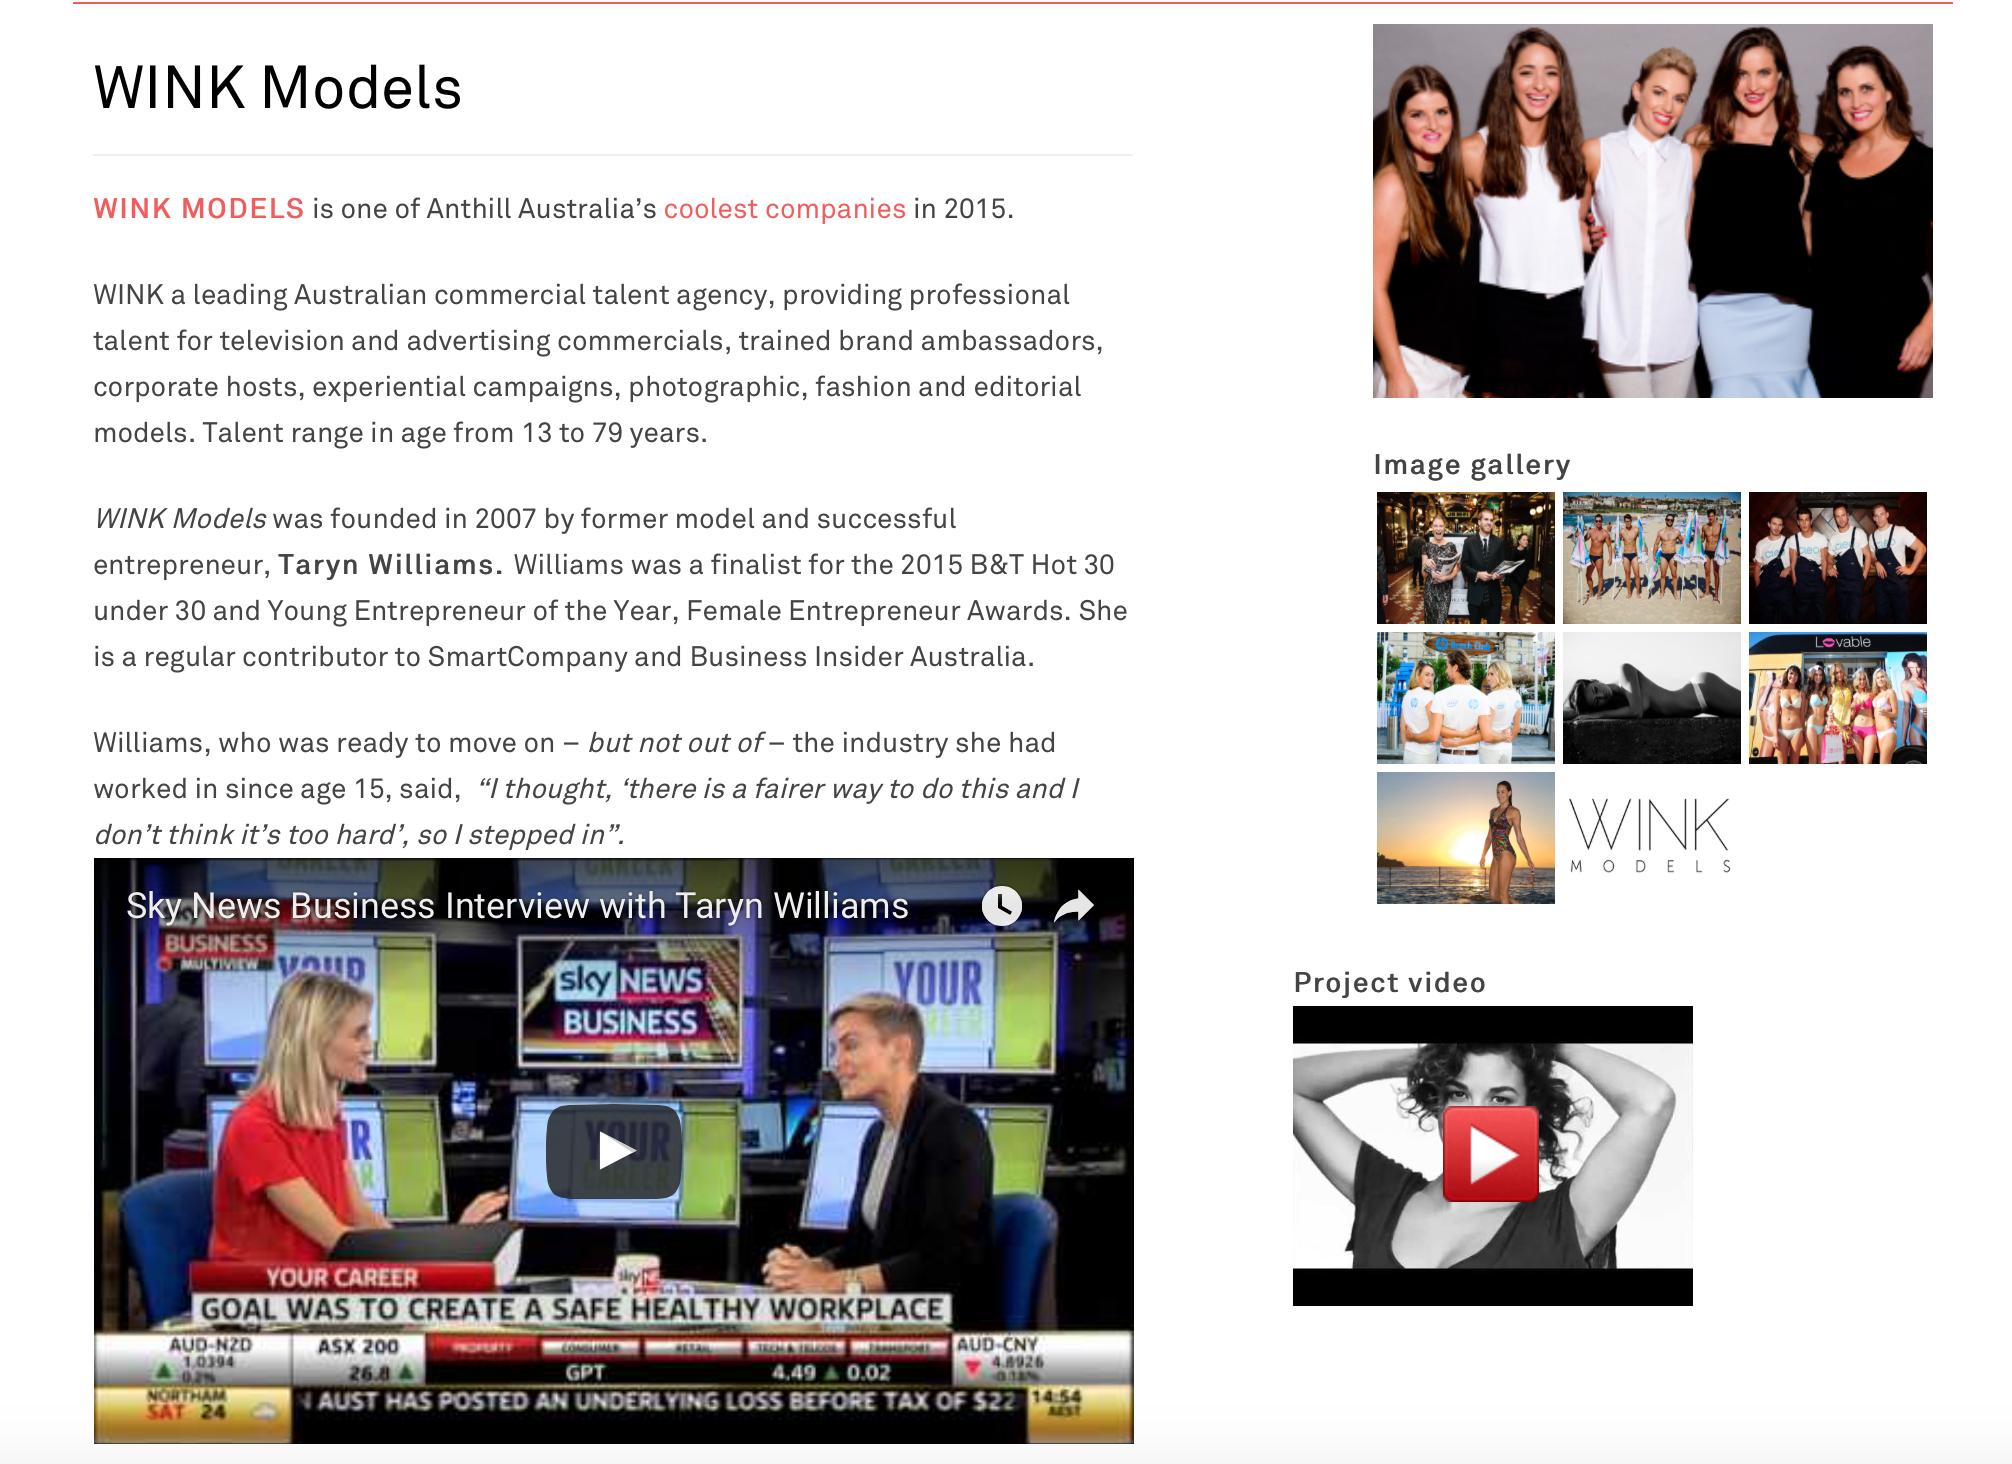 http://www.sammway.com.au/clients/wink-models/